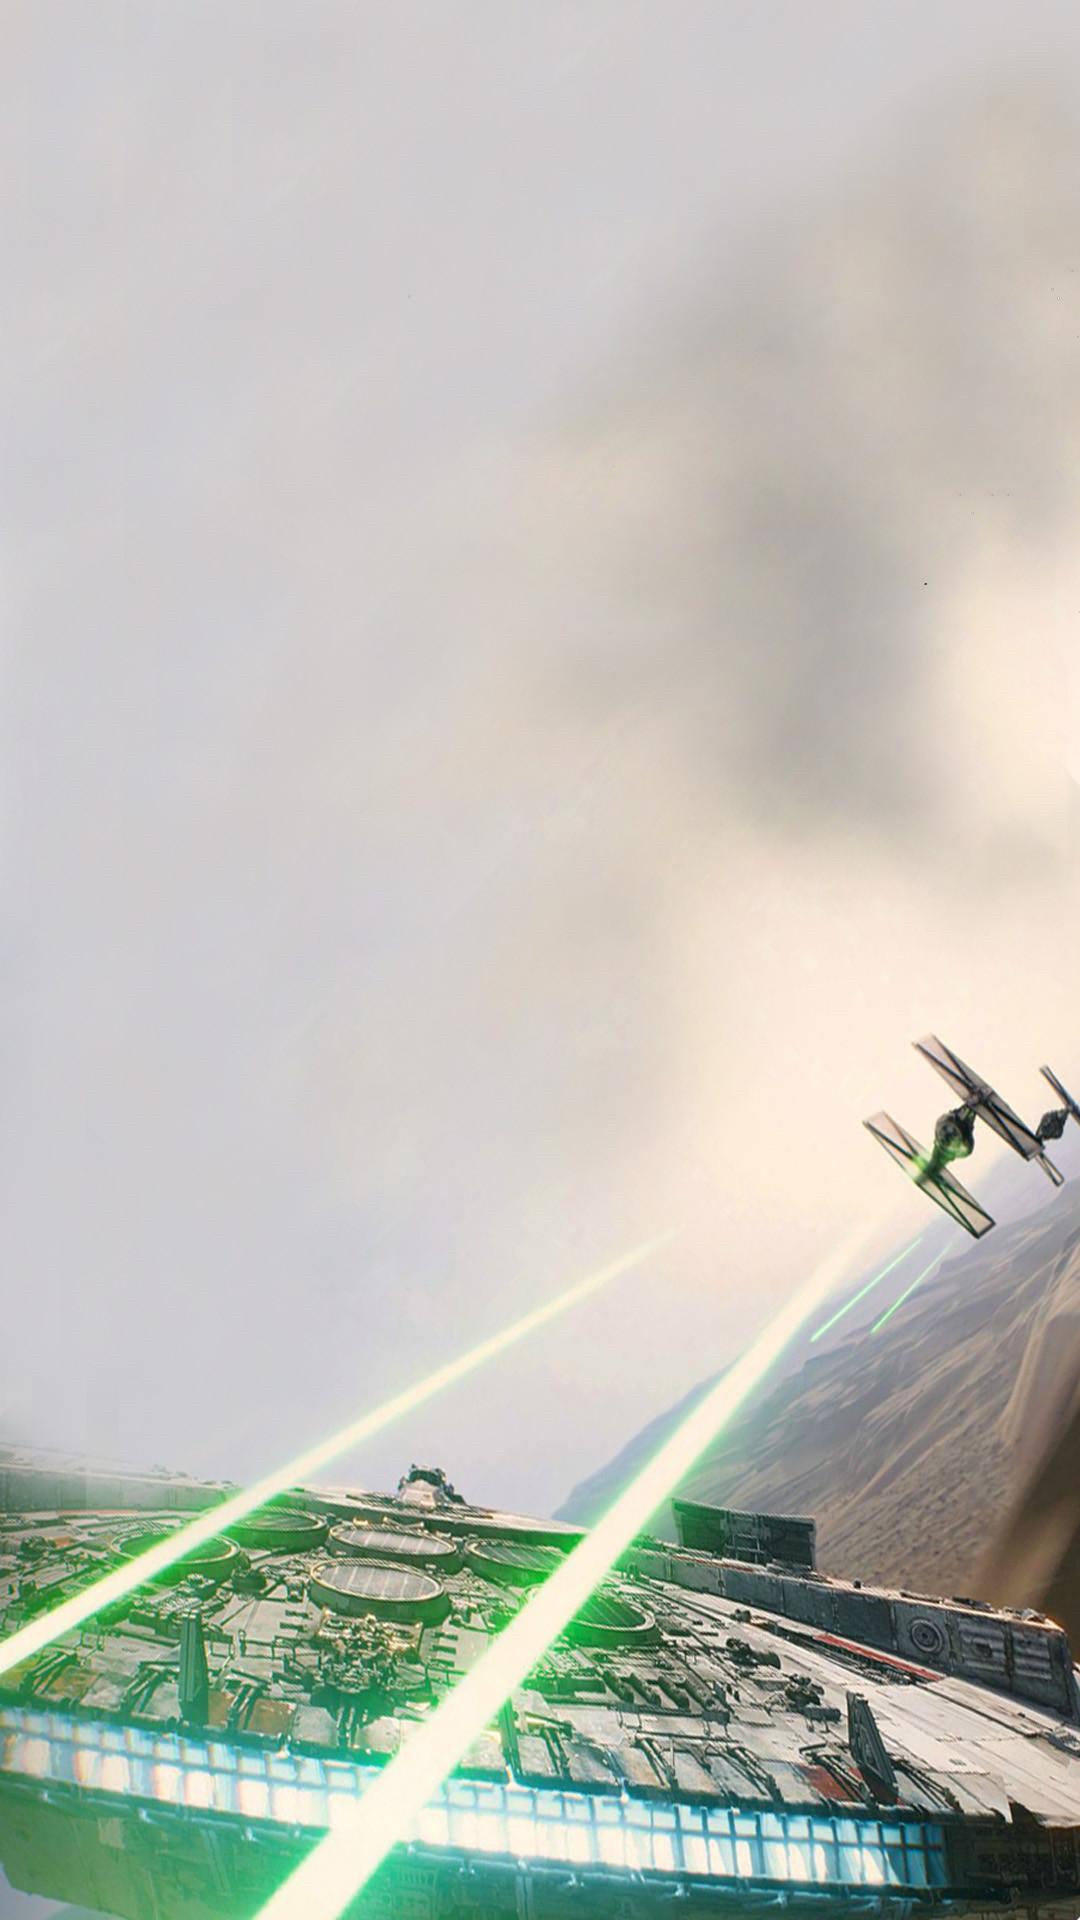 Star Wars Battlefront Death Star New Mode Details Star Wars · Iphone 7Hd  WallpaperStar …